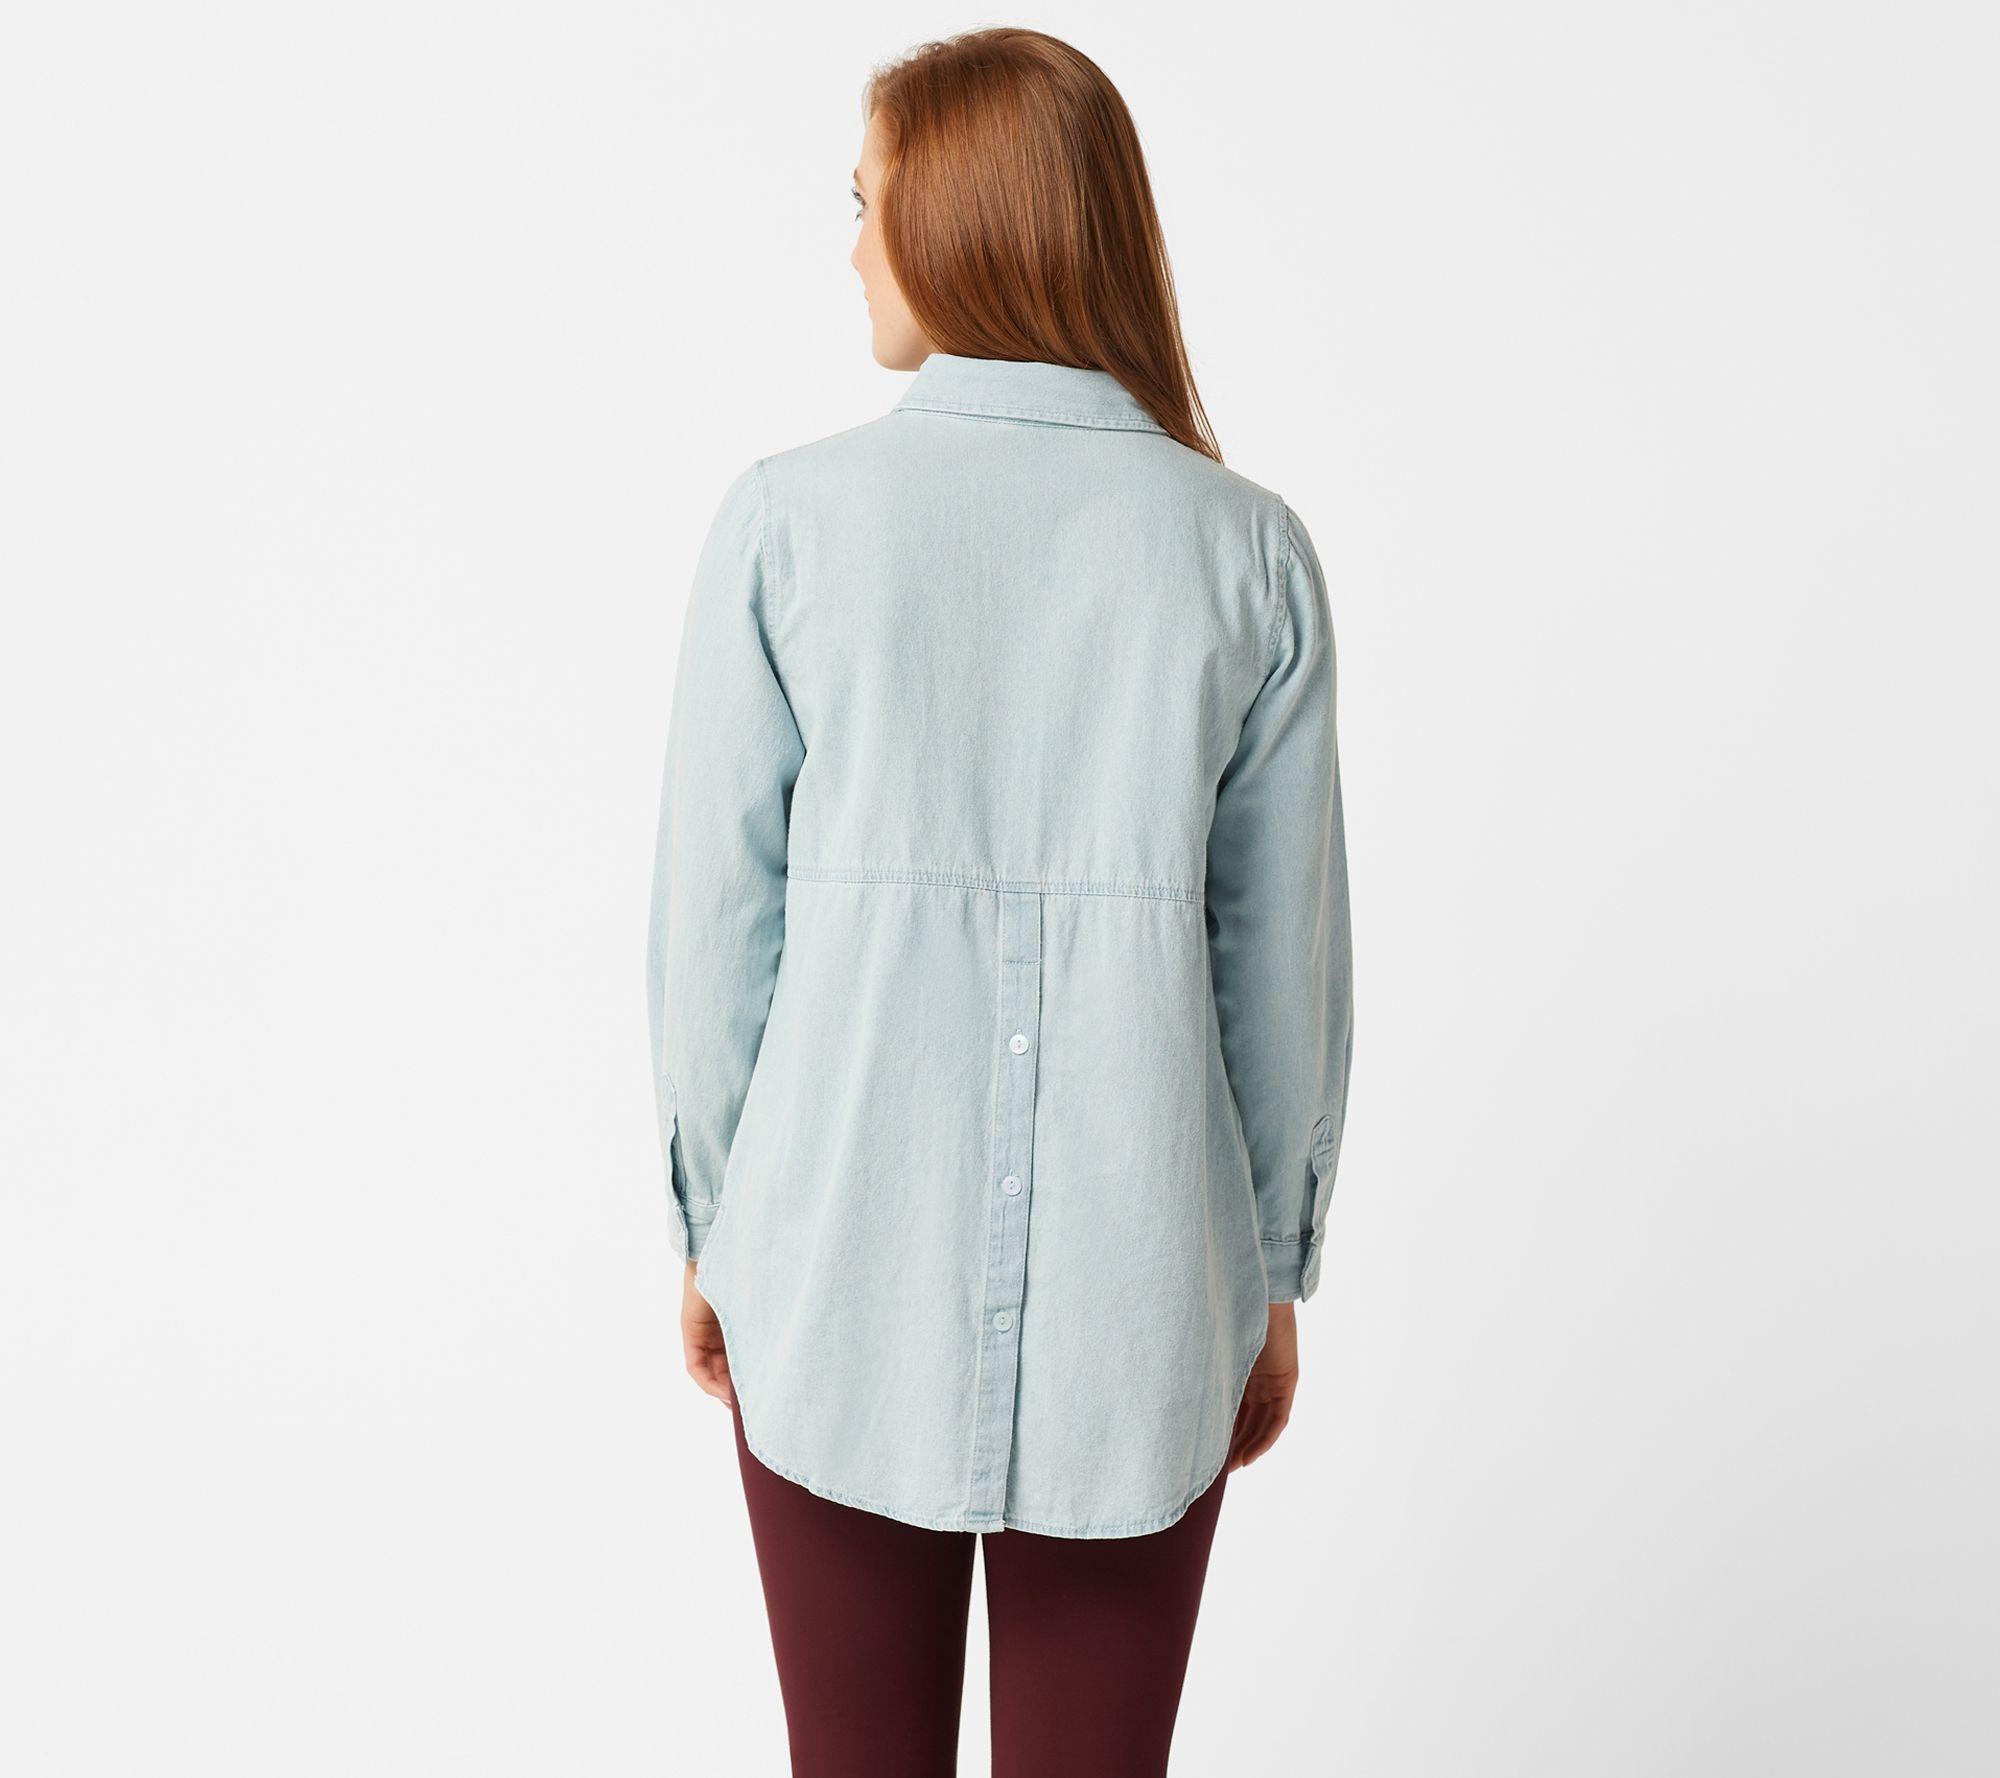 Joan Rivers Denim Shirt with Back Button Details — QVC com